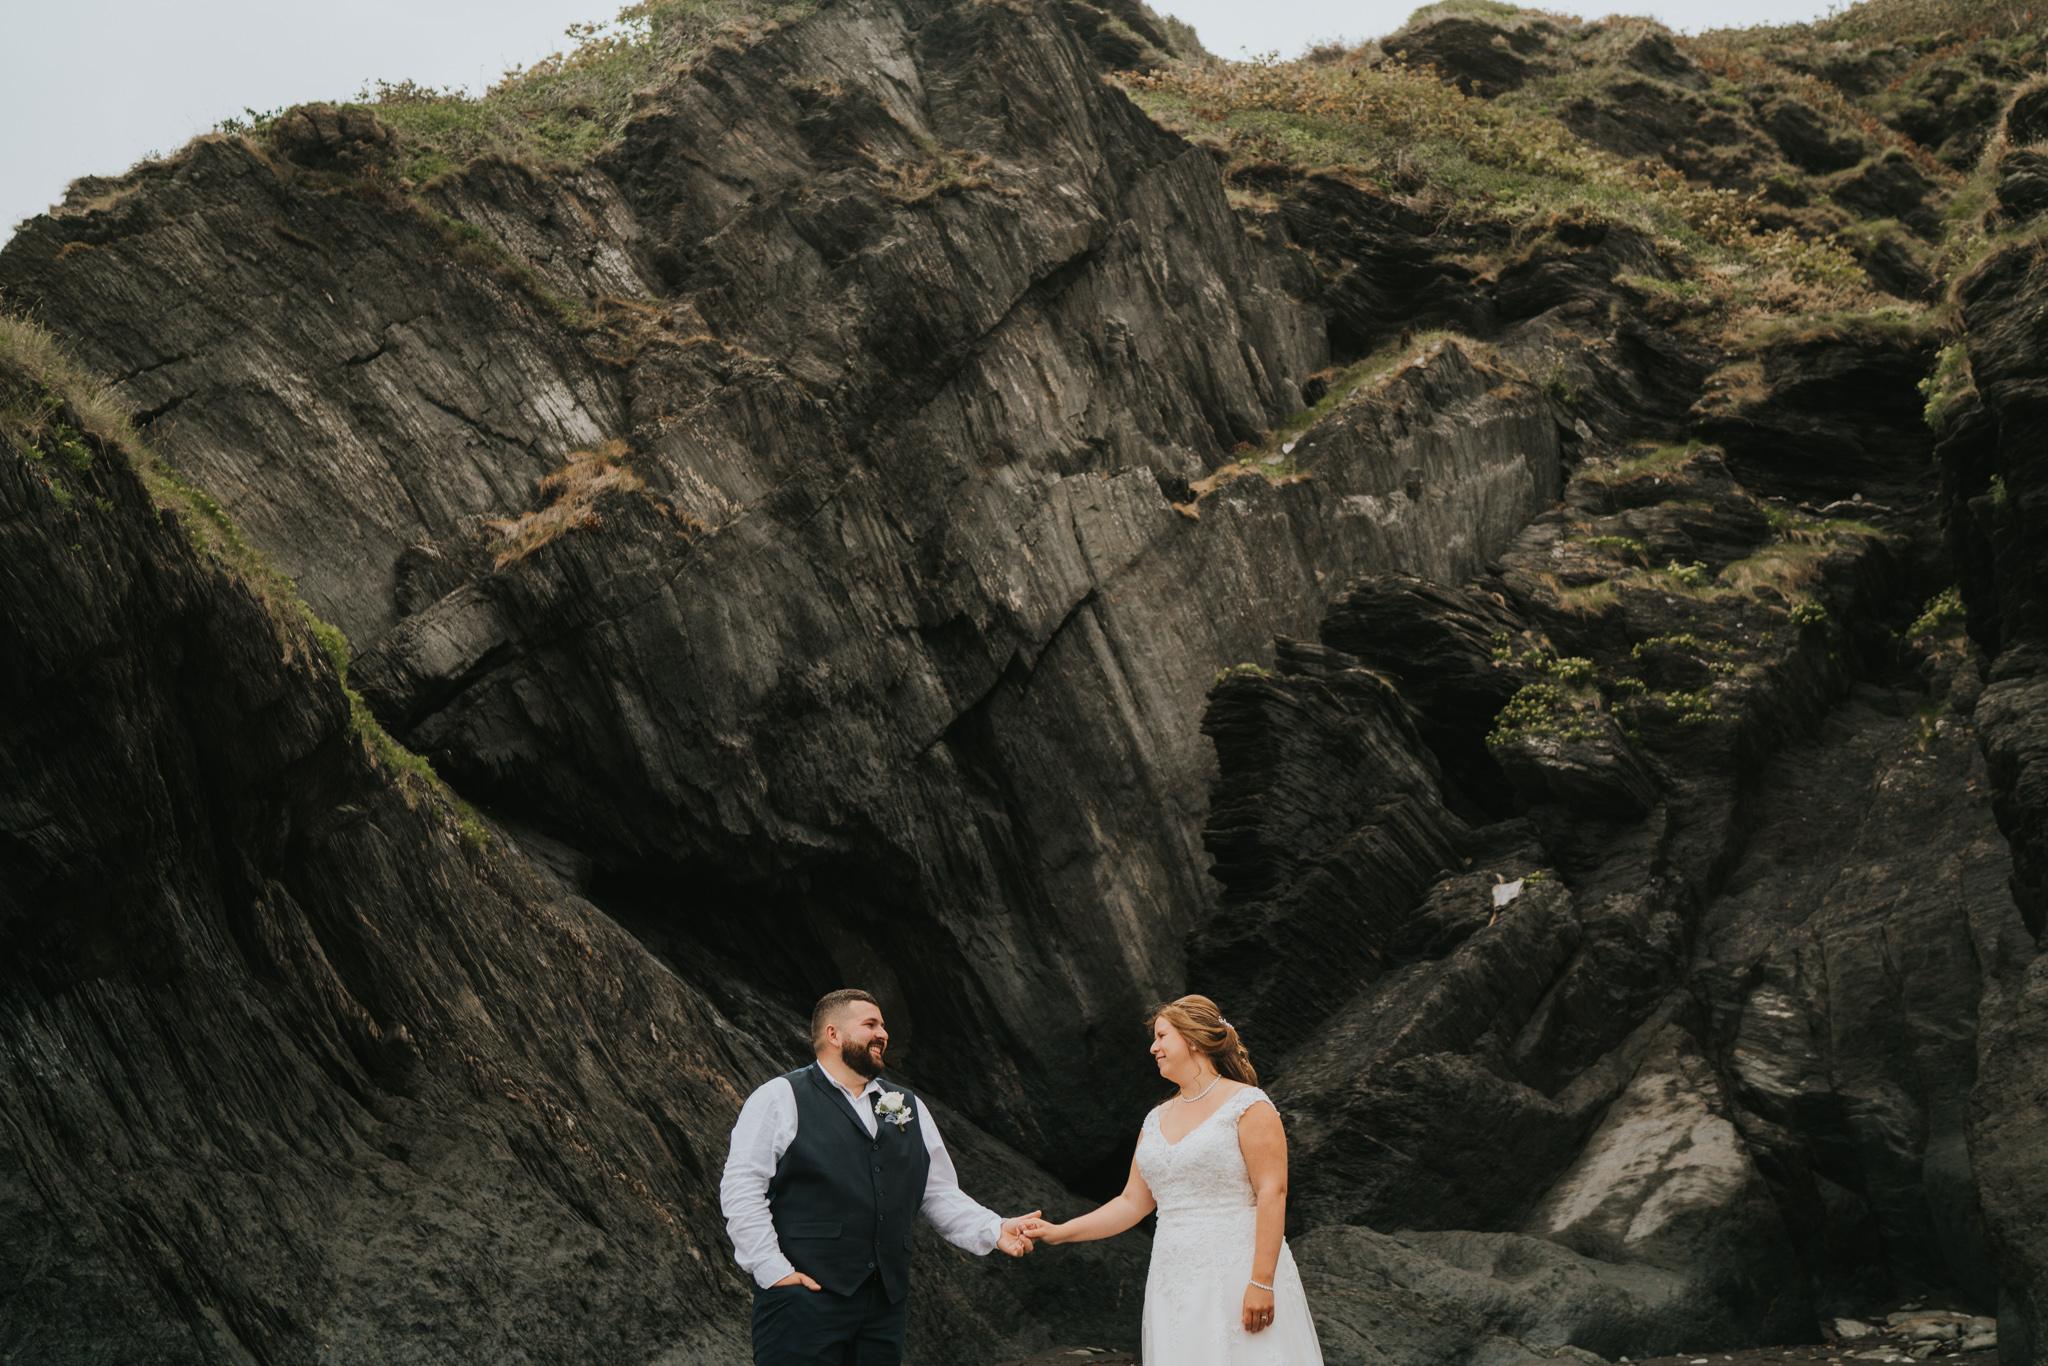 john-amy-relaxed-beach-wedding-tunnels-beaches-ilfracombe-north-devon-grace-elizabeth-colchester-essex-alternative-relaxed-wedding-photography-devon-suffolk-norfolk-essex (93 of 159).jpg